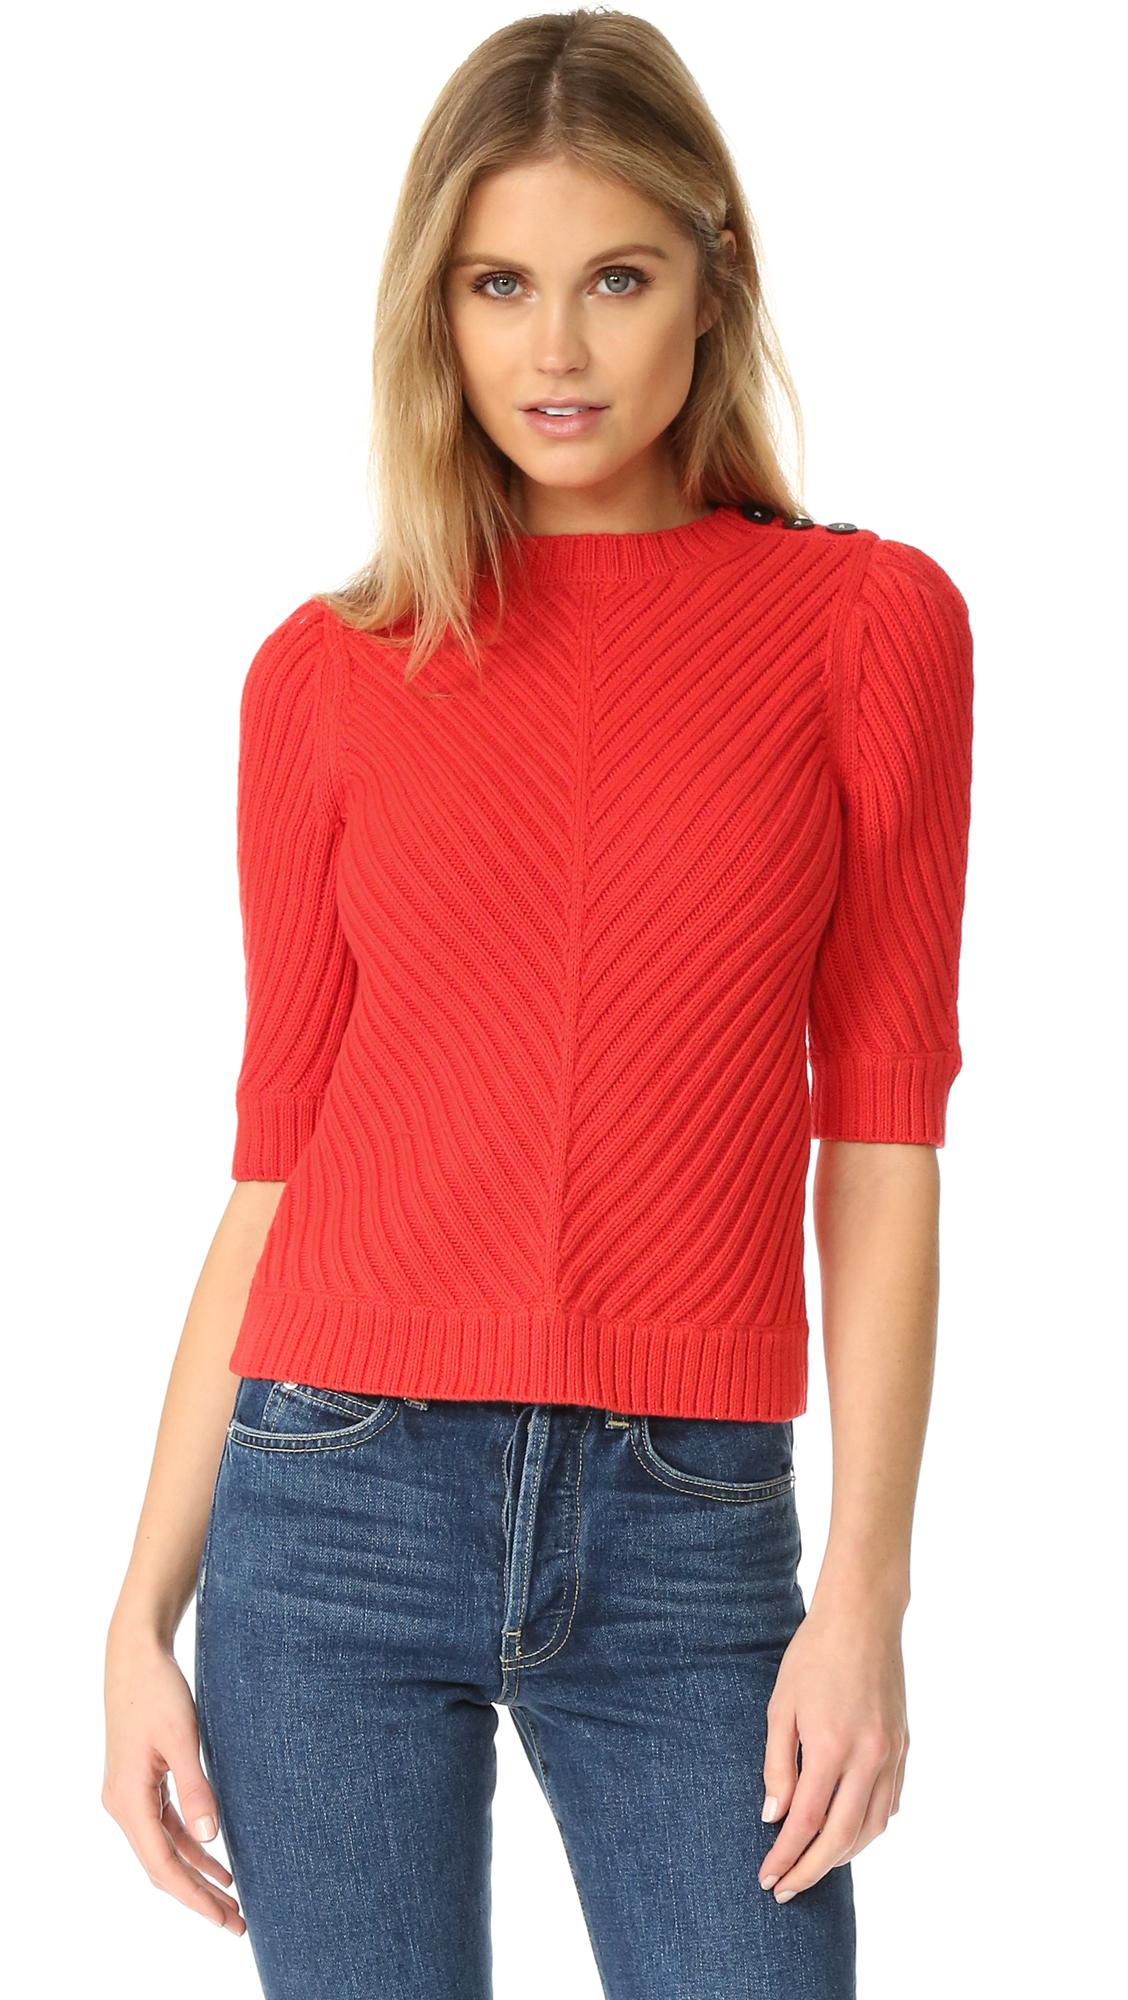 b6d84ed821a La Vie Rebecca Taylor Rib Sweater - Poppy